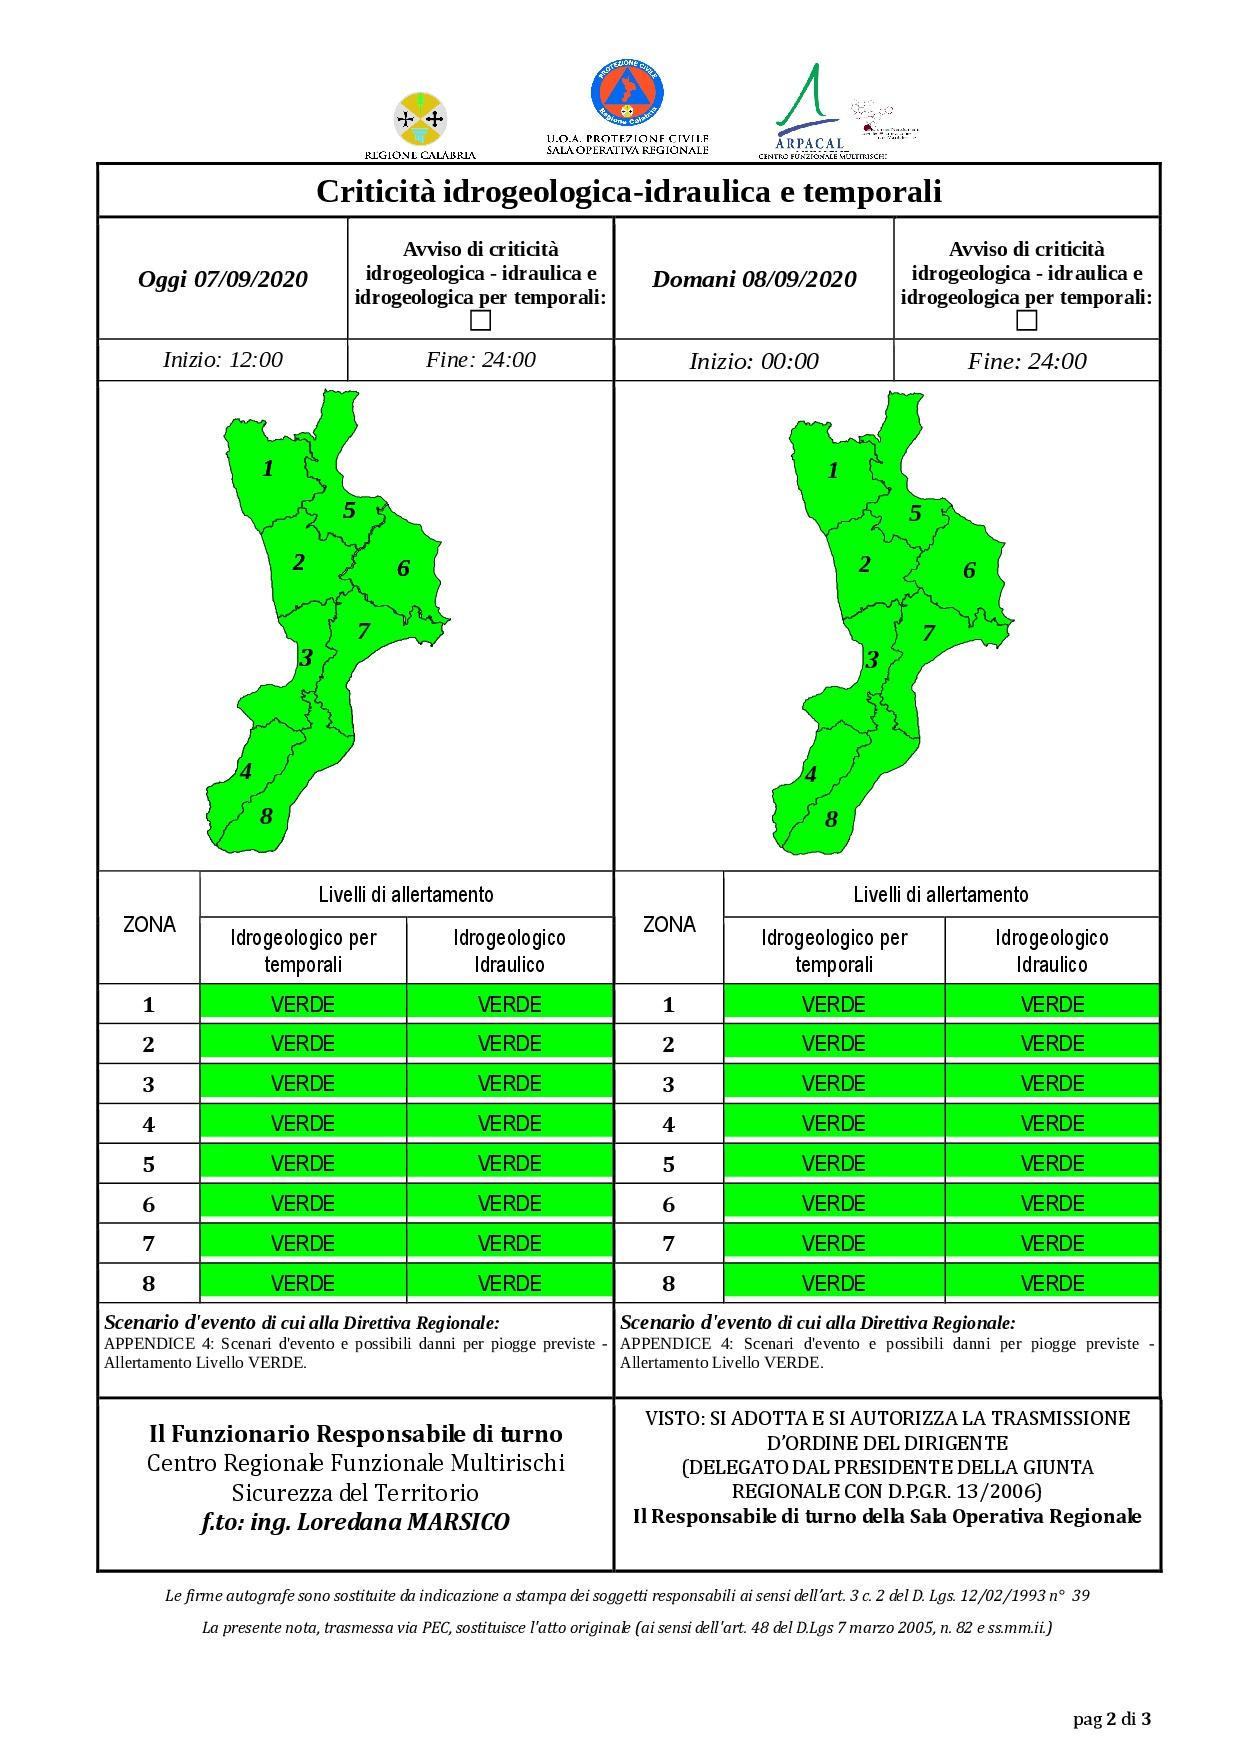 Criticità idrogeologica-idraulica e temporali in Calabria 07-09-2020